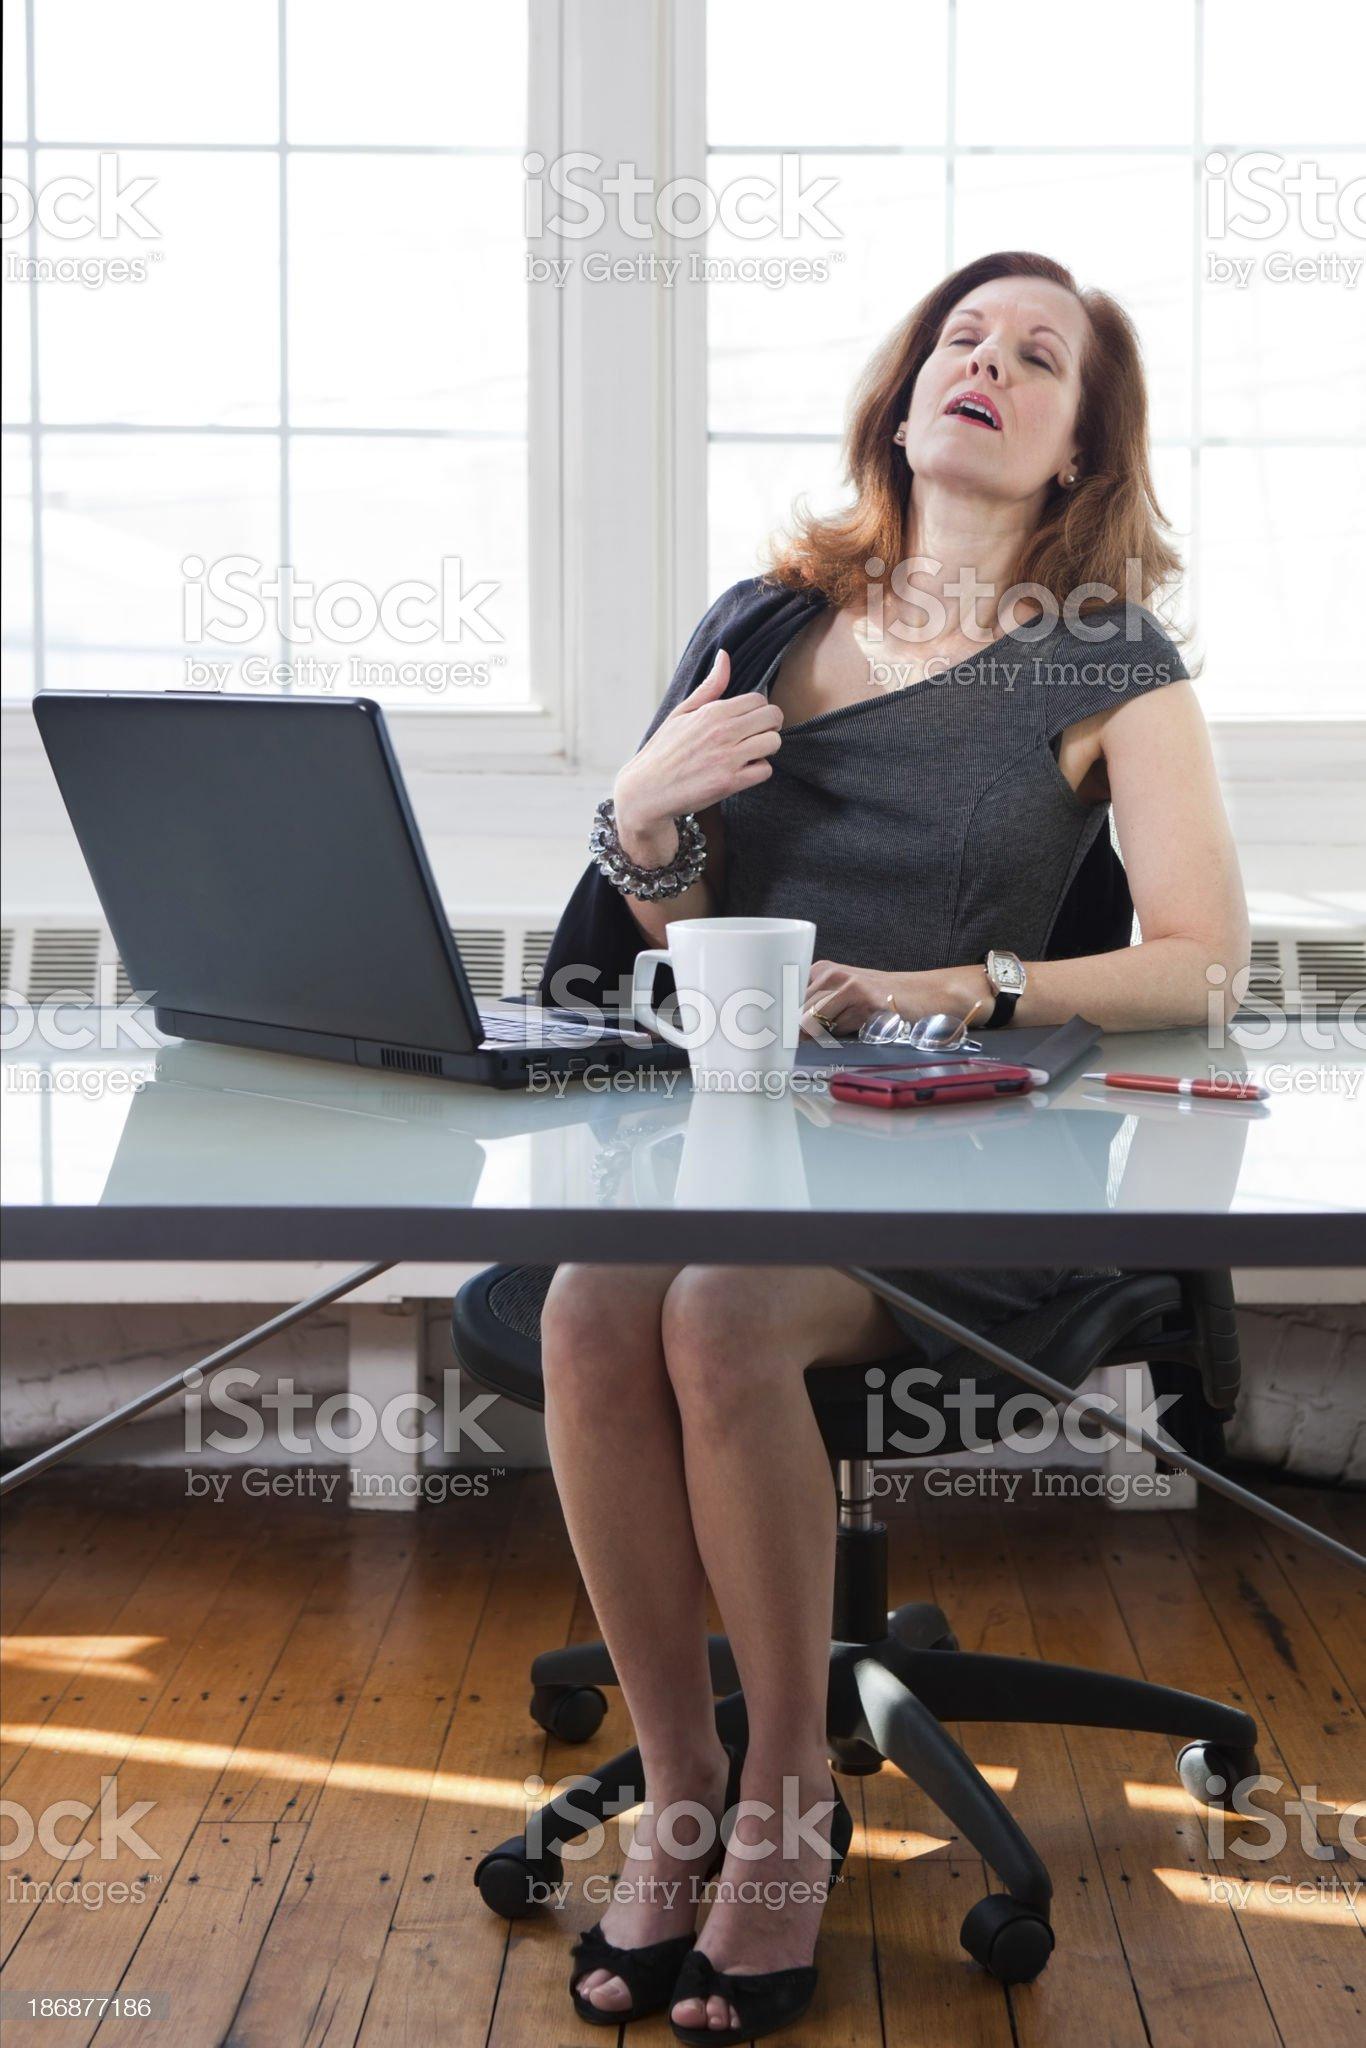 Menopausal woman having a hot flash at the office royalty-free stock photo